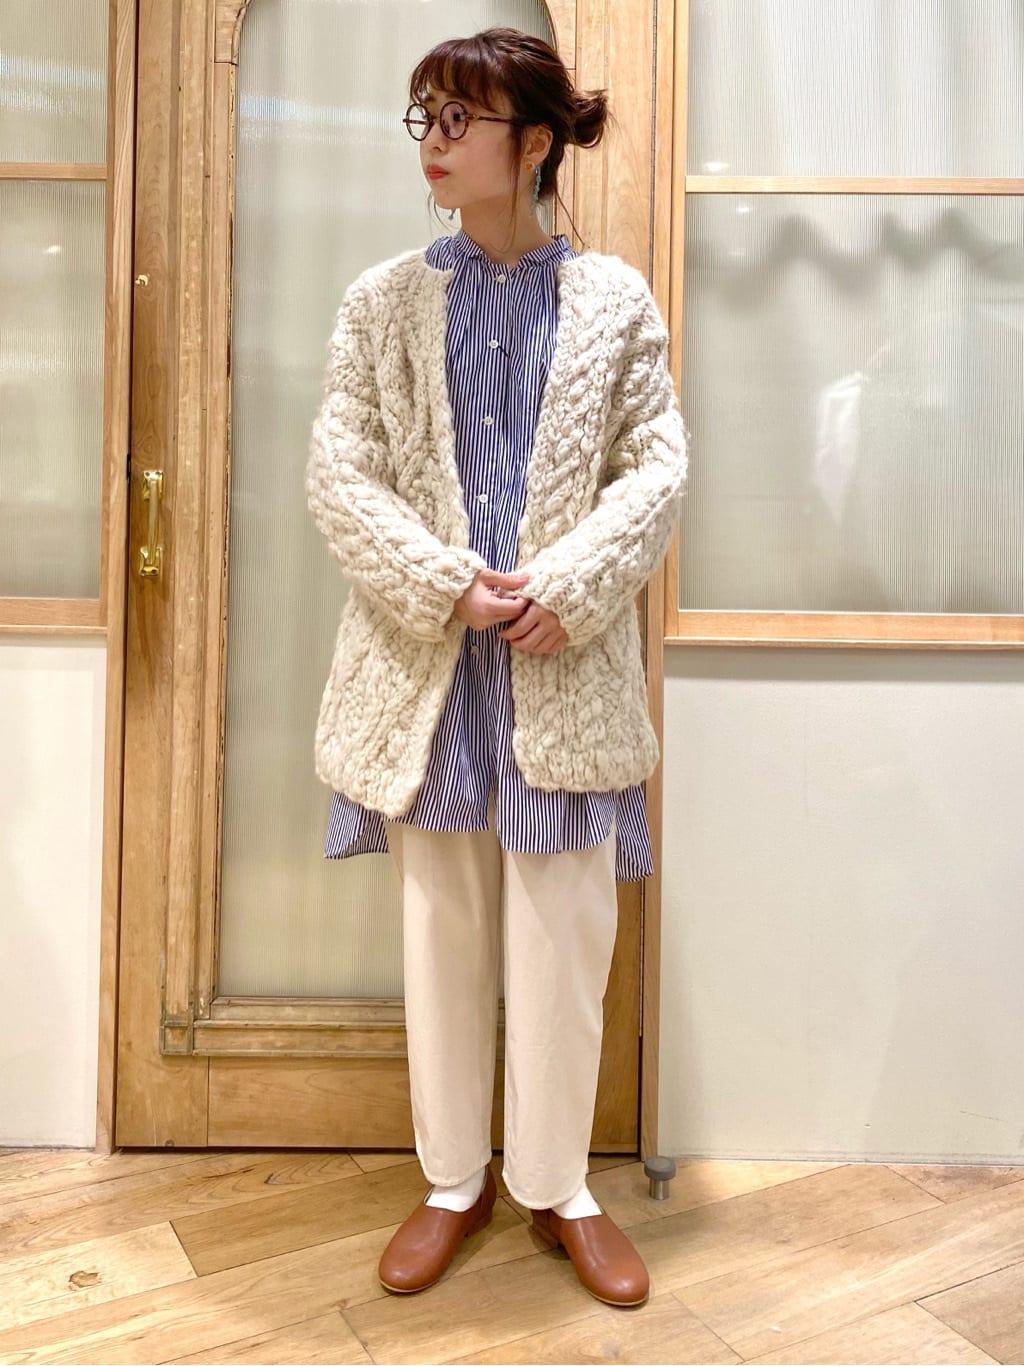 bulle de savon 新宿ミロード 身長:157cm 2021.10.04